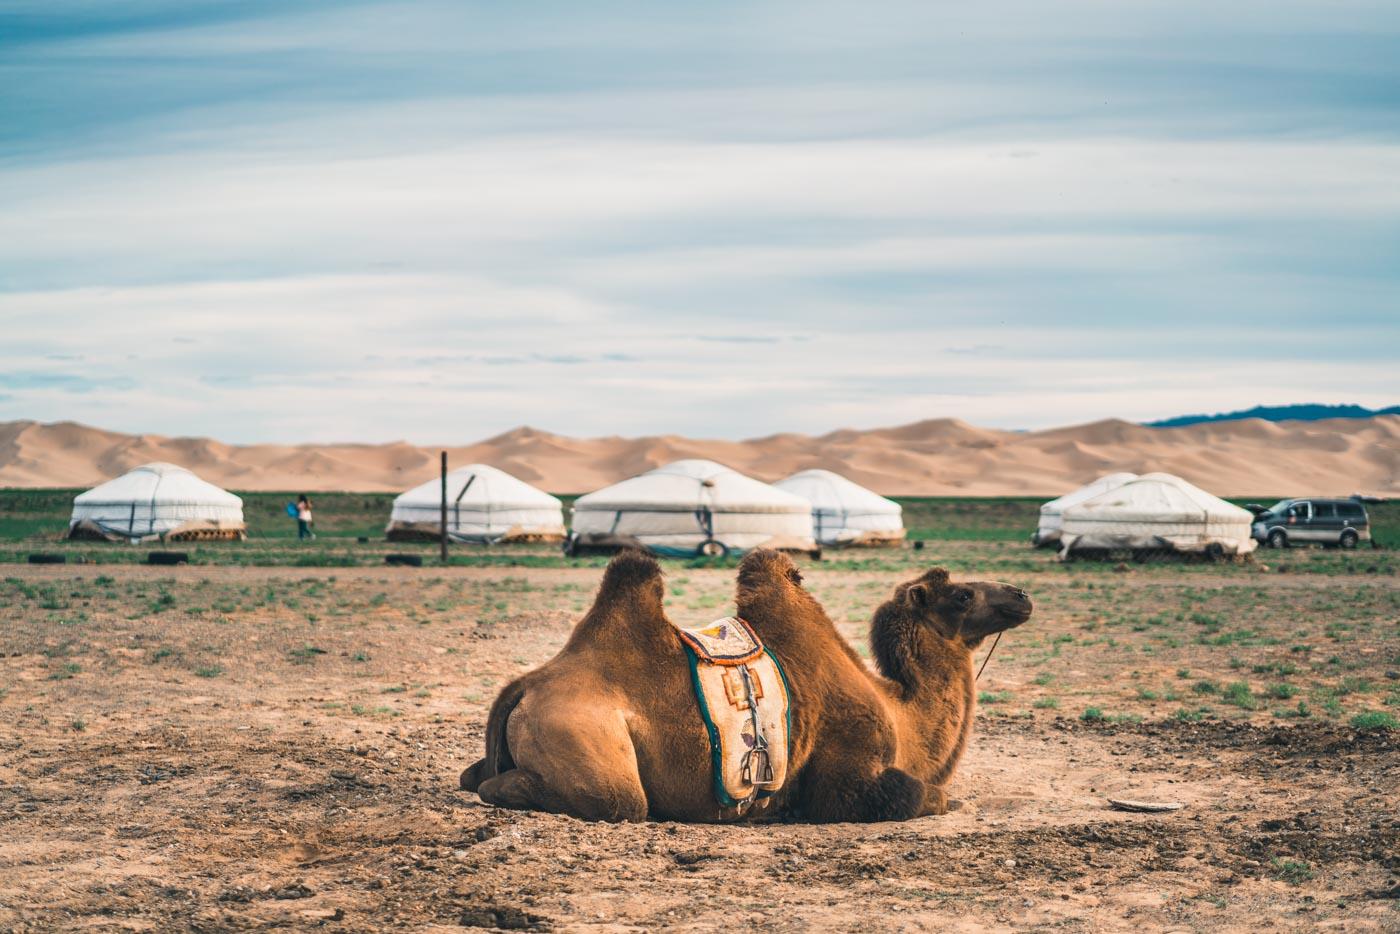 Camel resting near a ger camp at Khongoryn Els Sand Dunes, Gobi Desert